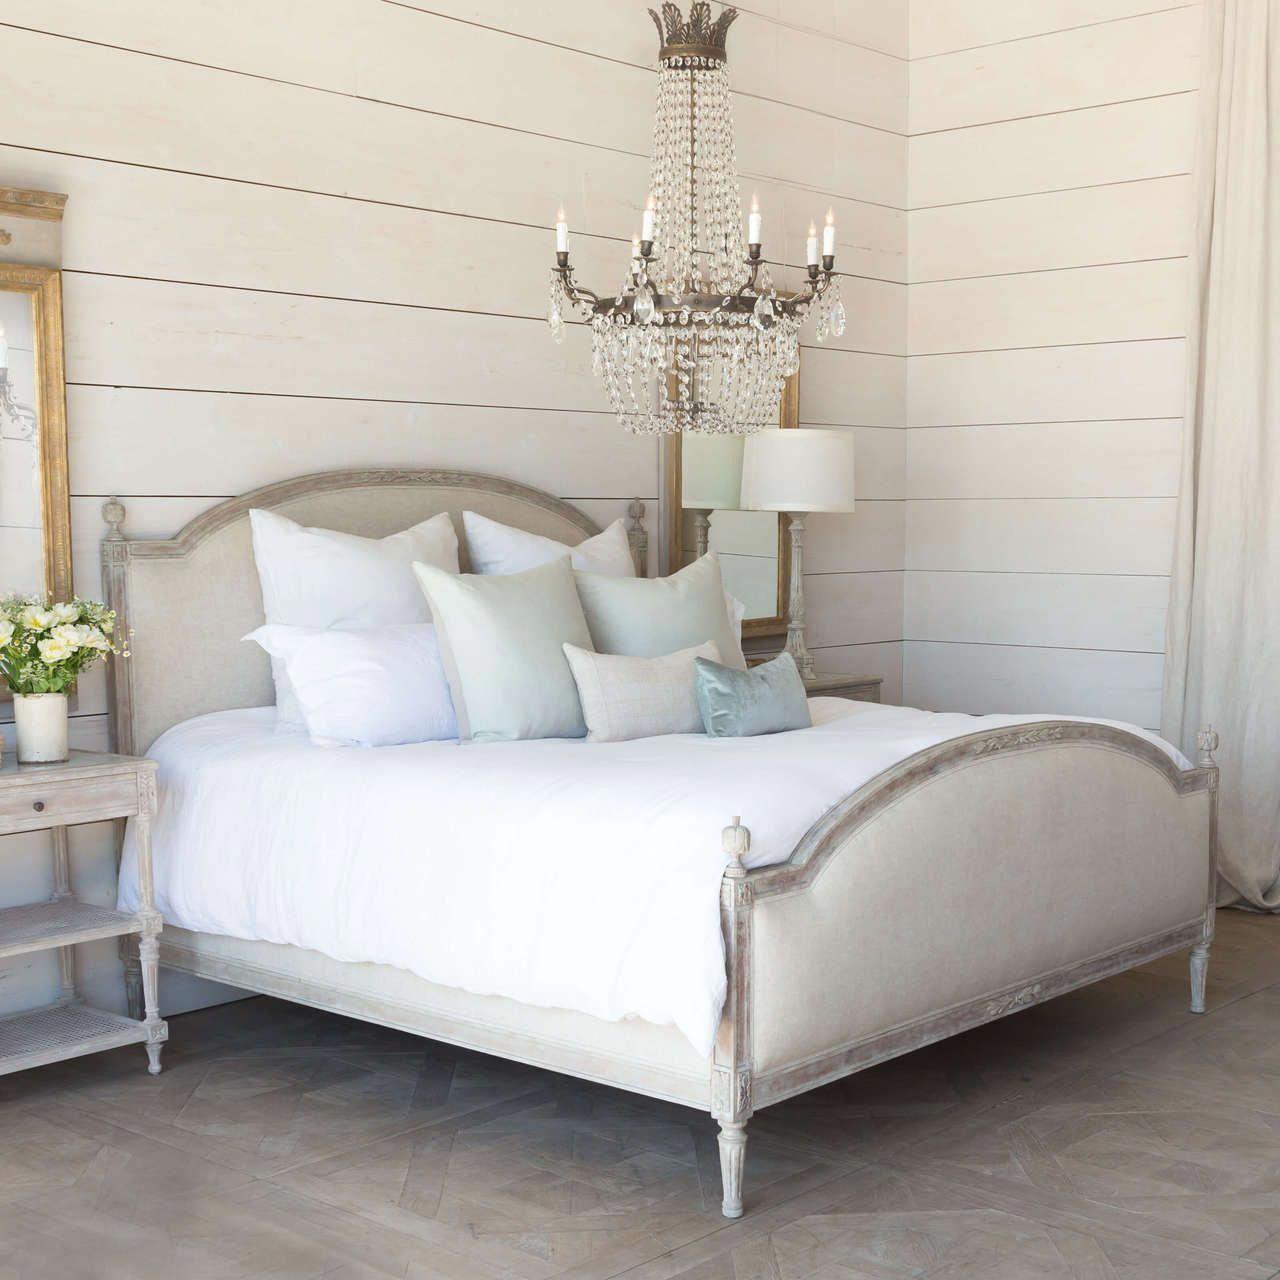 beach house cottage interiors BEACHHOUSEINTERIORS in 2020